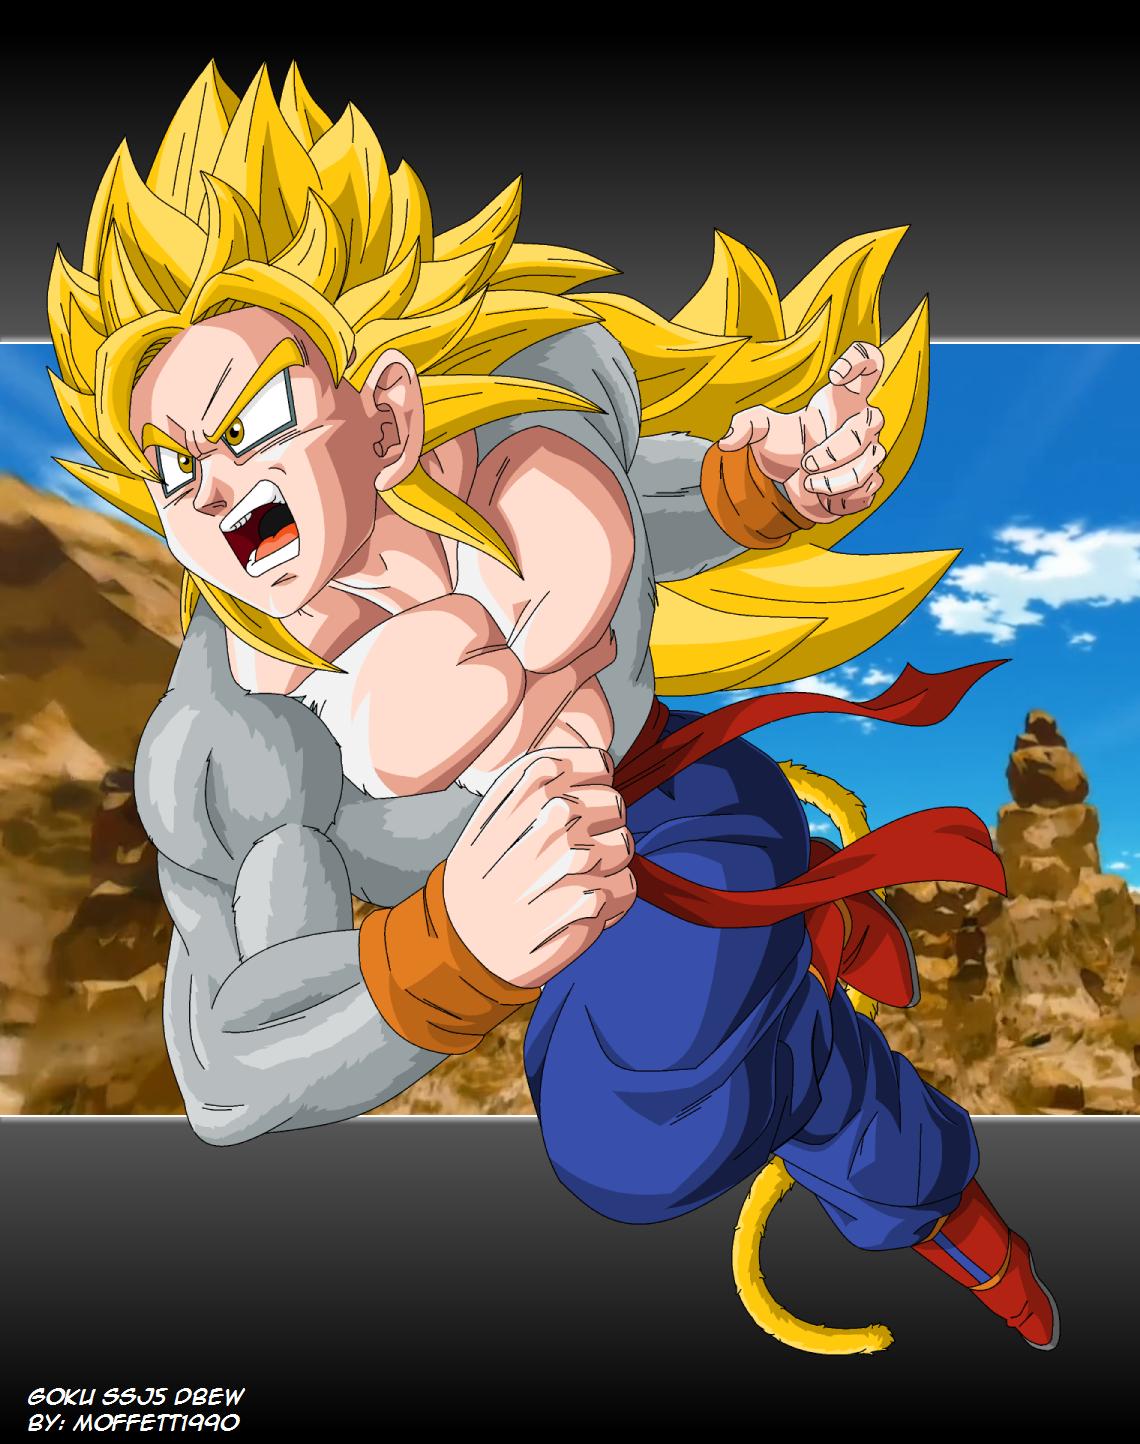 Goku SSJ5 DragonBall EW ArtTrade by Moffett1990